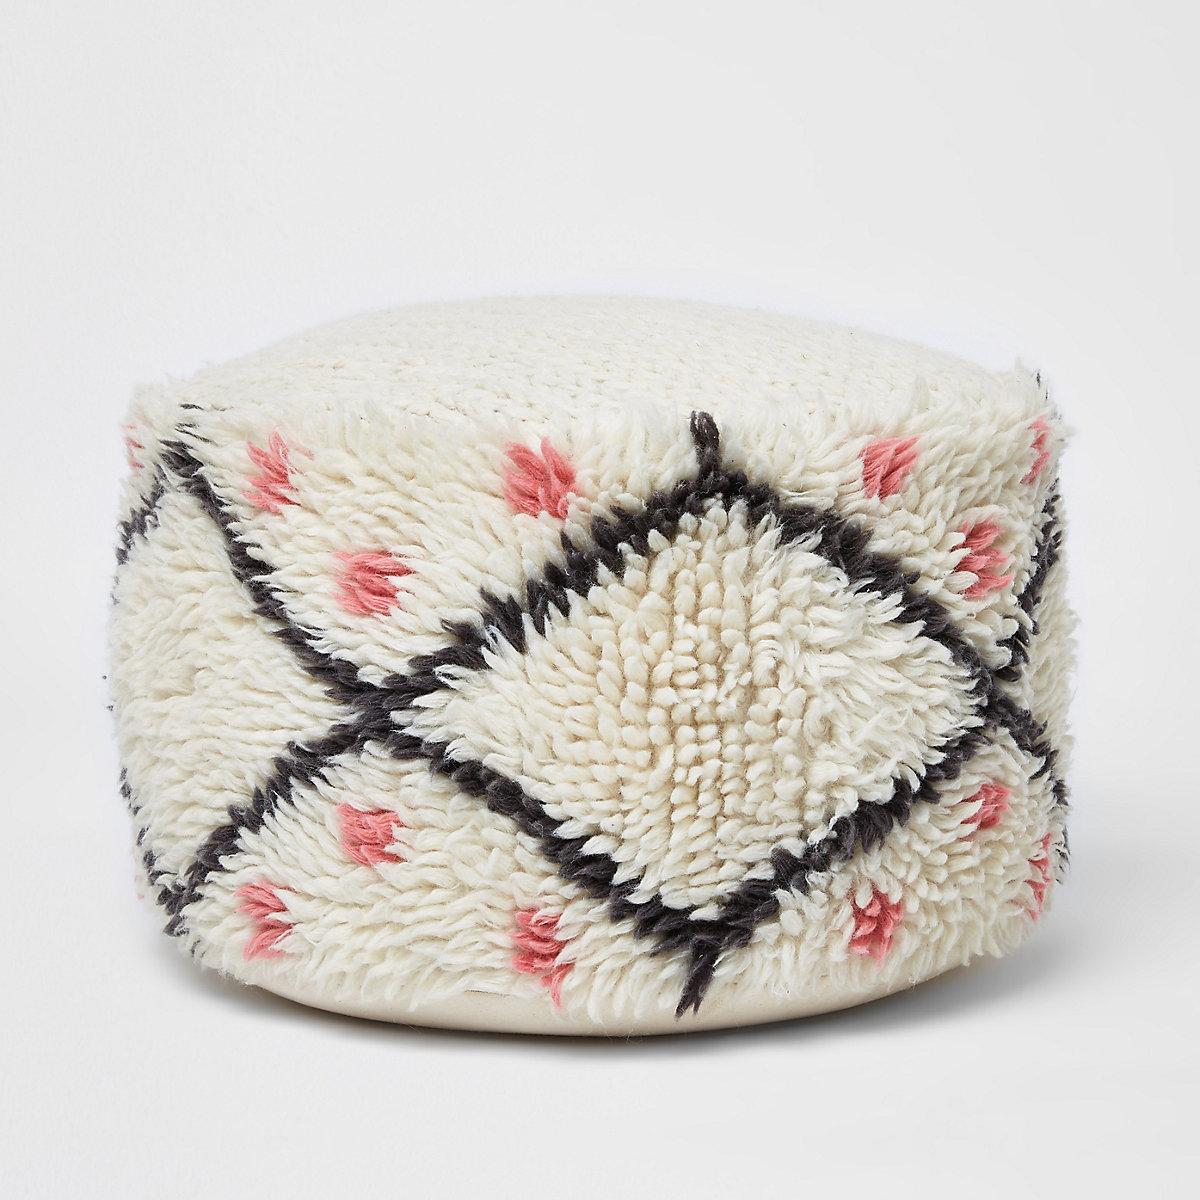 Cream wool pouffe